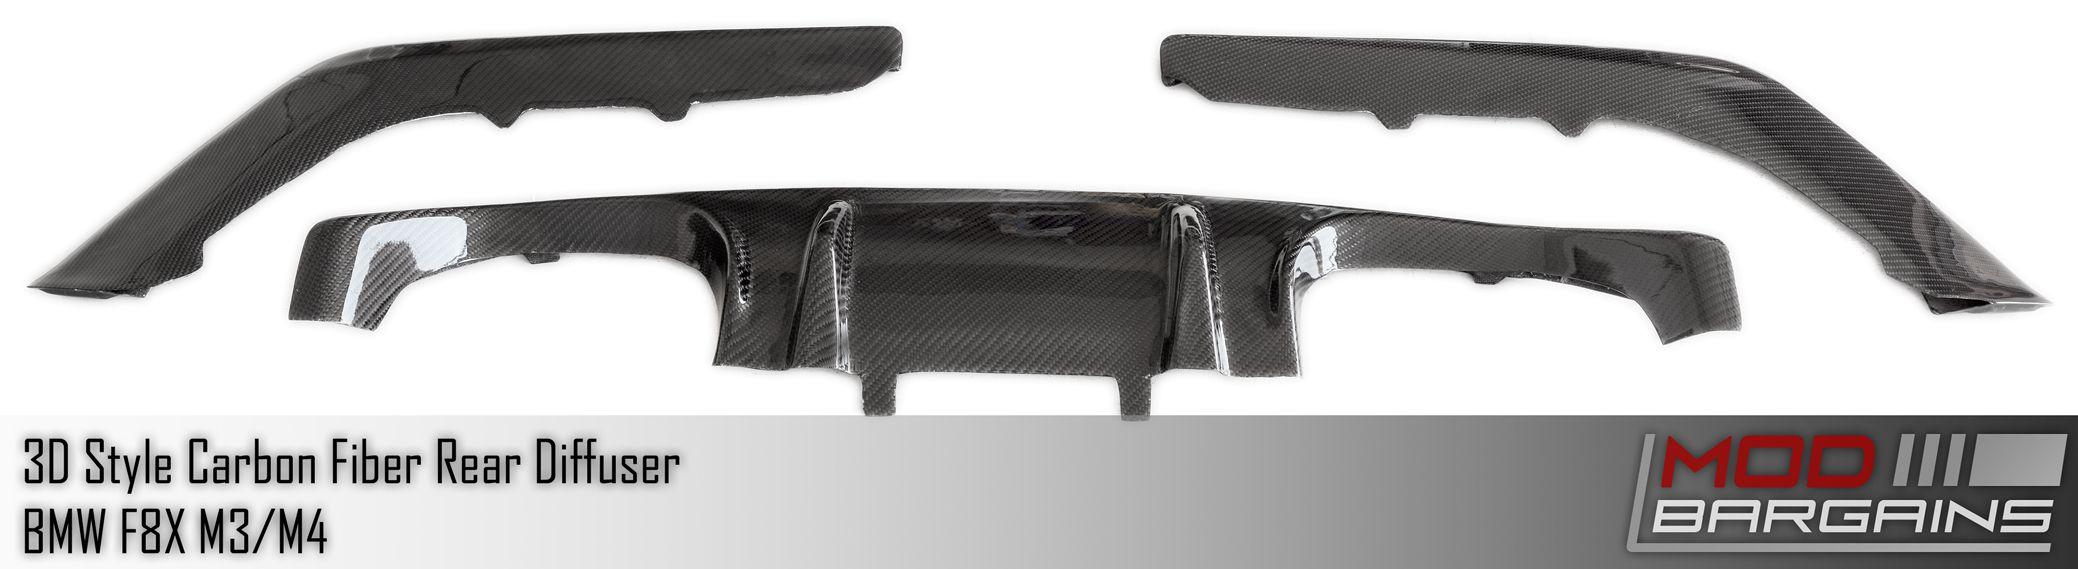 Layout View of 3 Piece 3D Carbon Fiber Rear Diffuser MBDI8X05